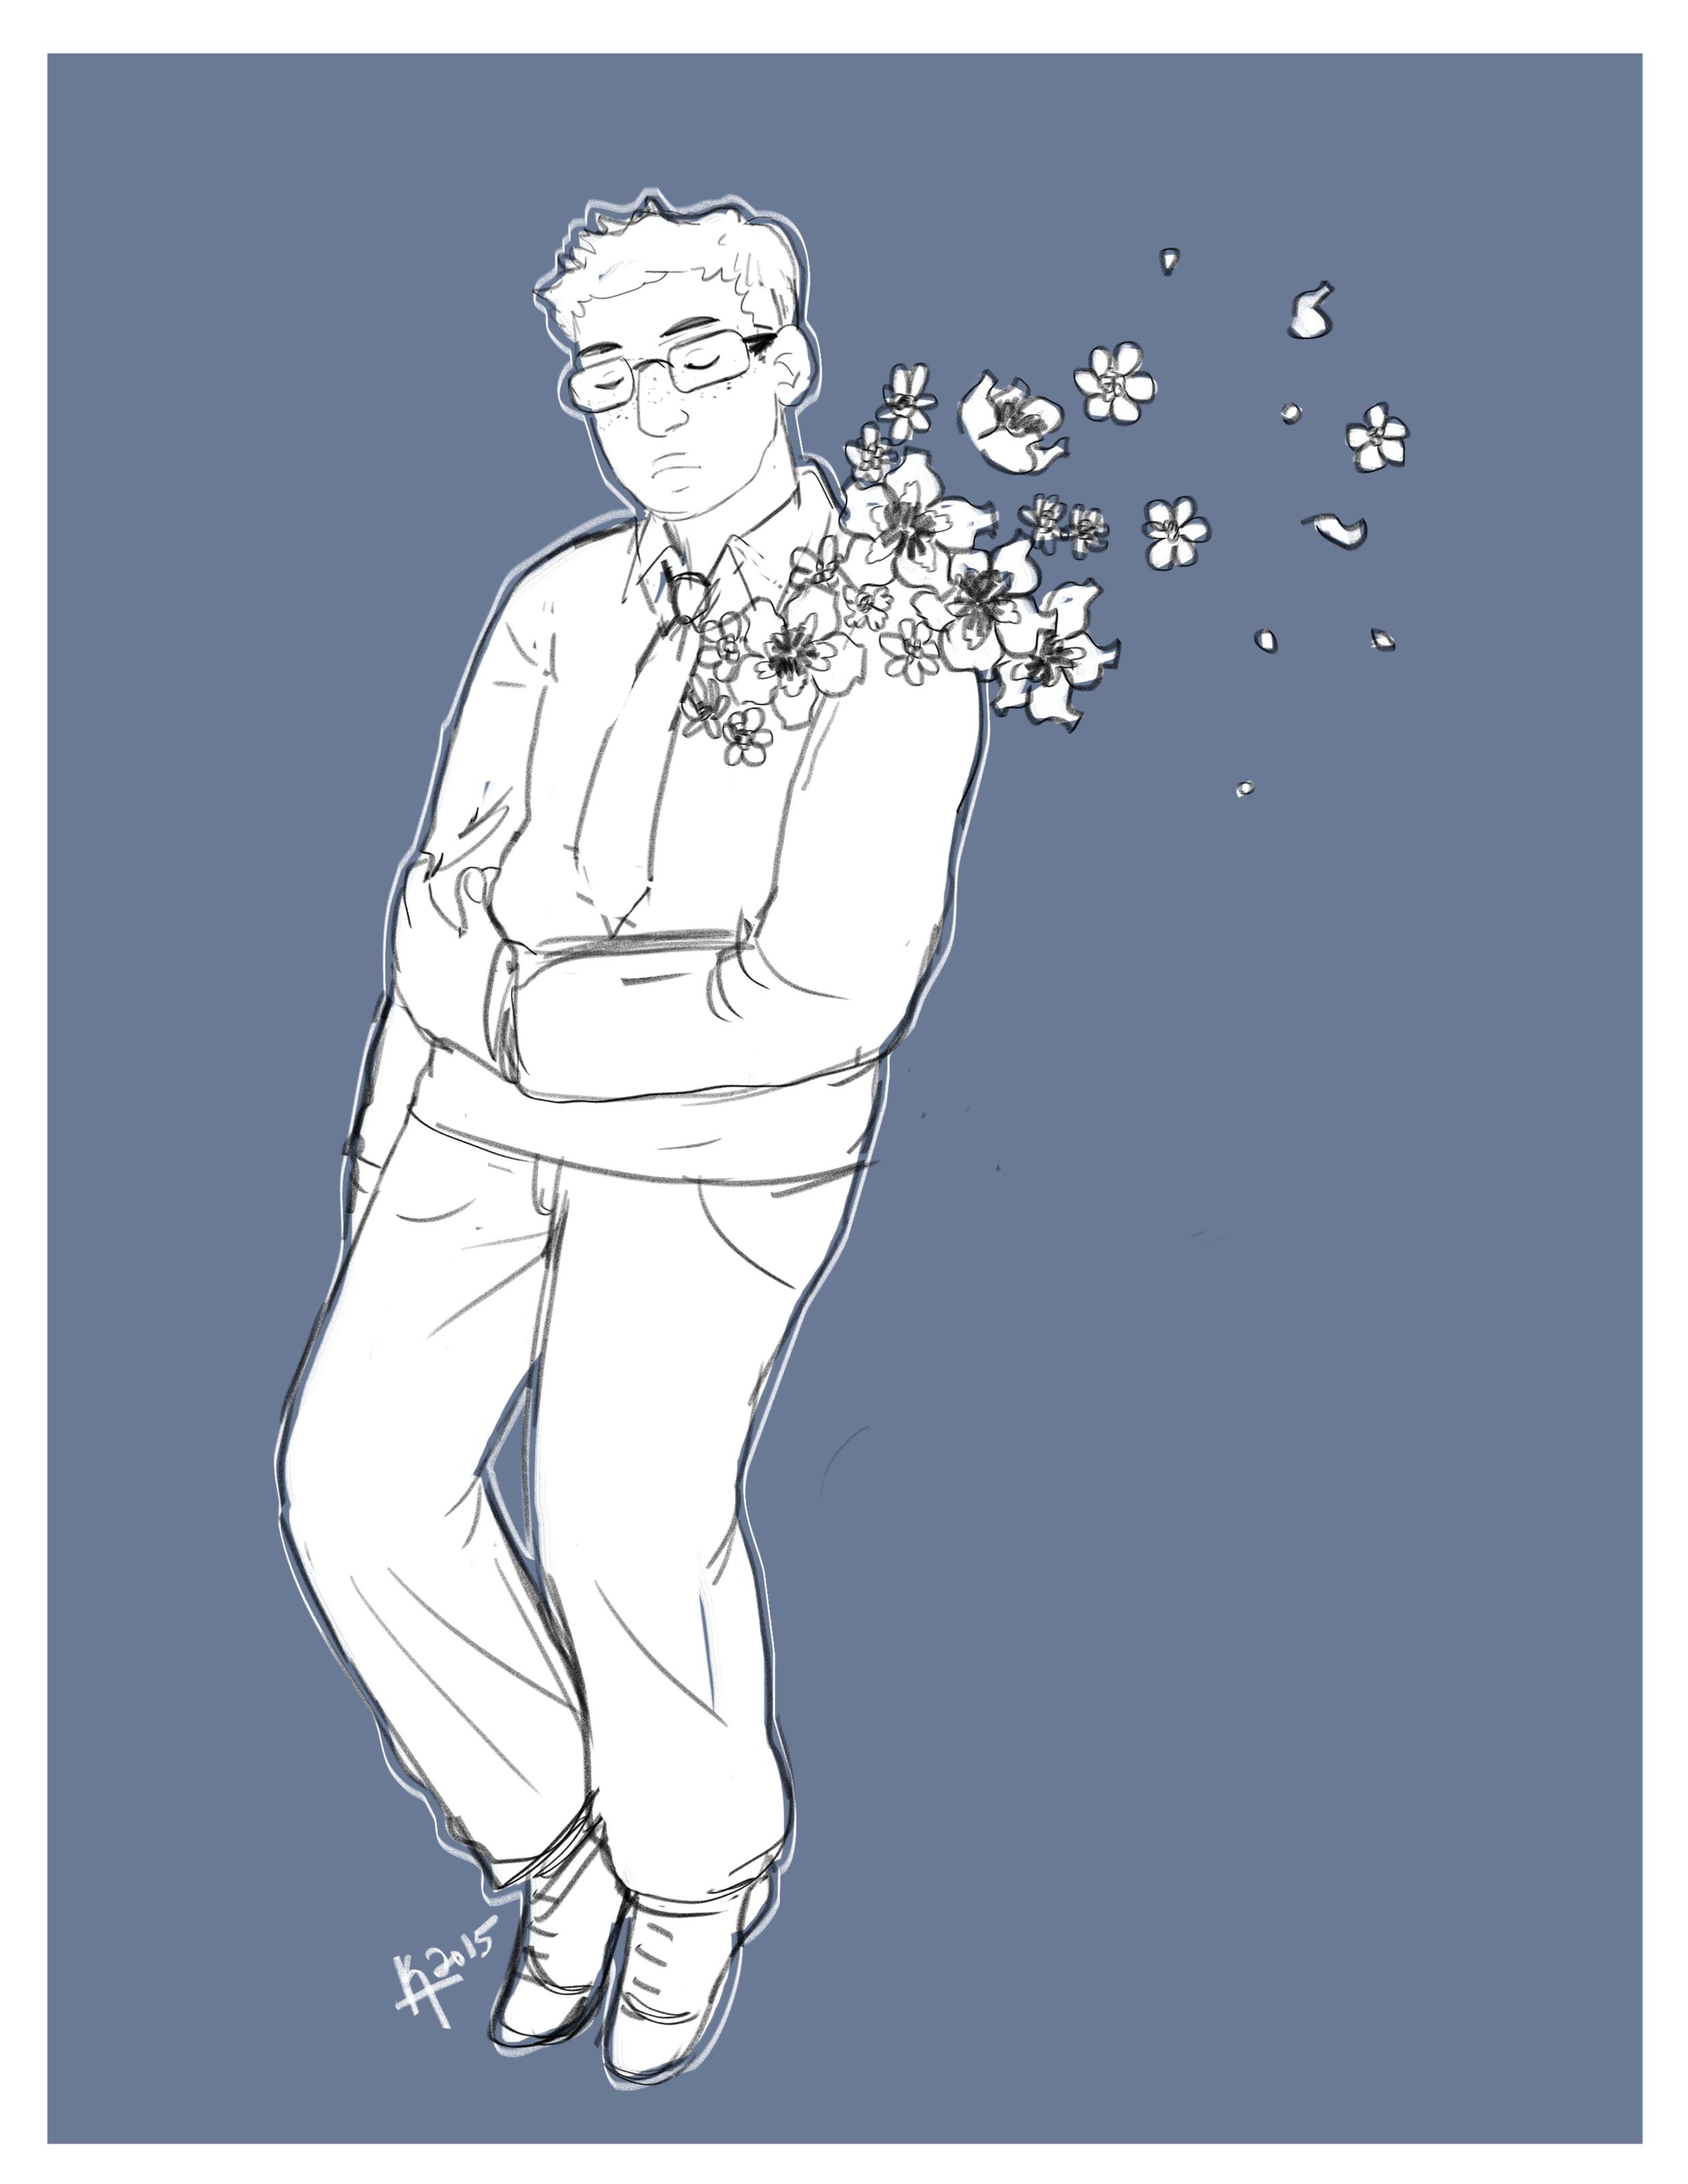 floral_houssam.png